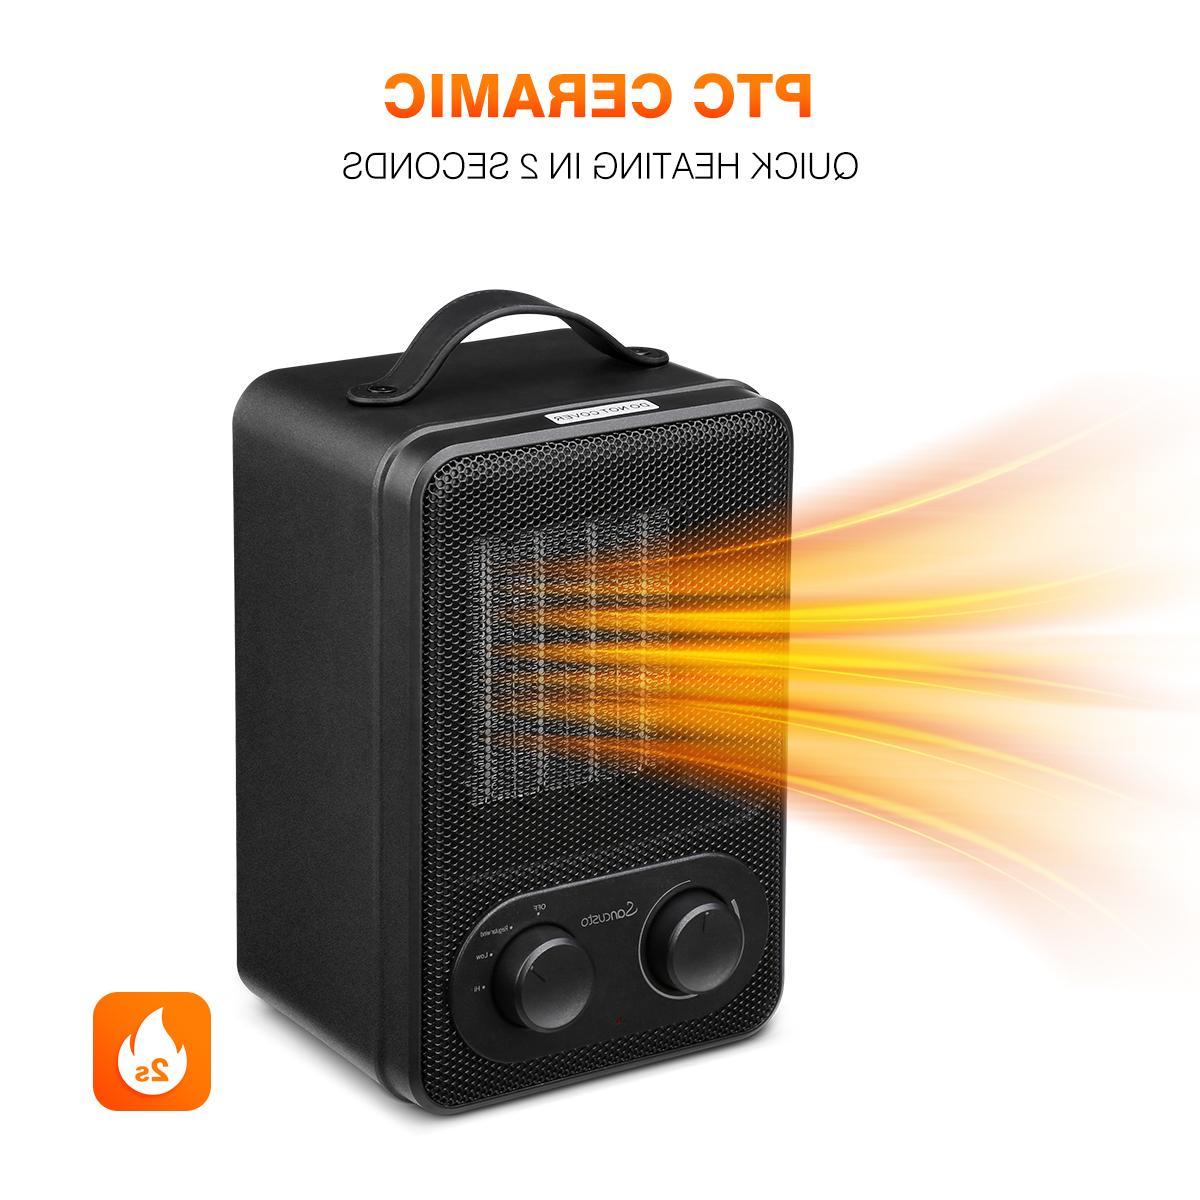 sancusto dh qn03 1800w auto oscillation overheating